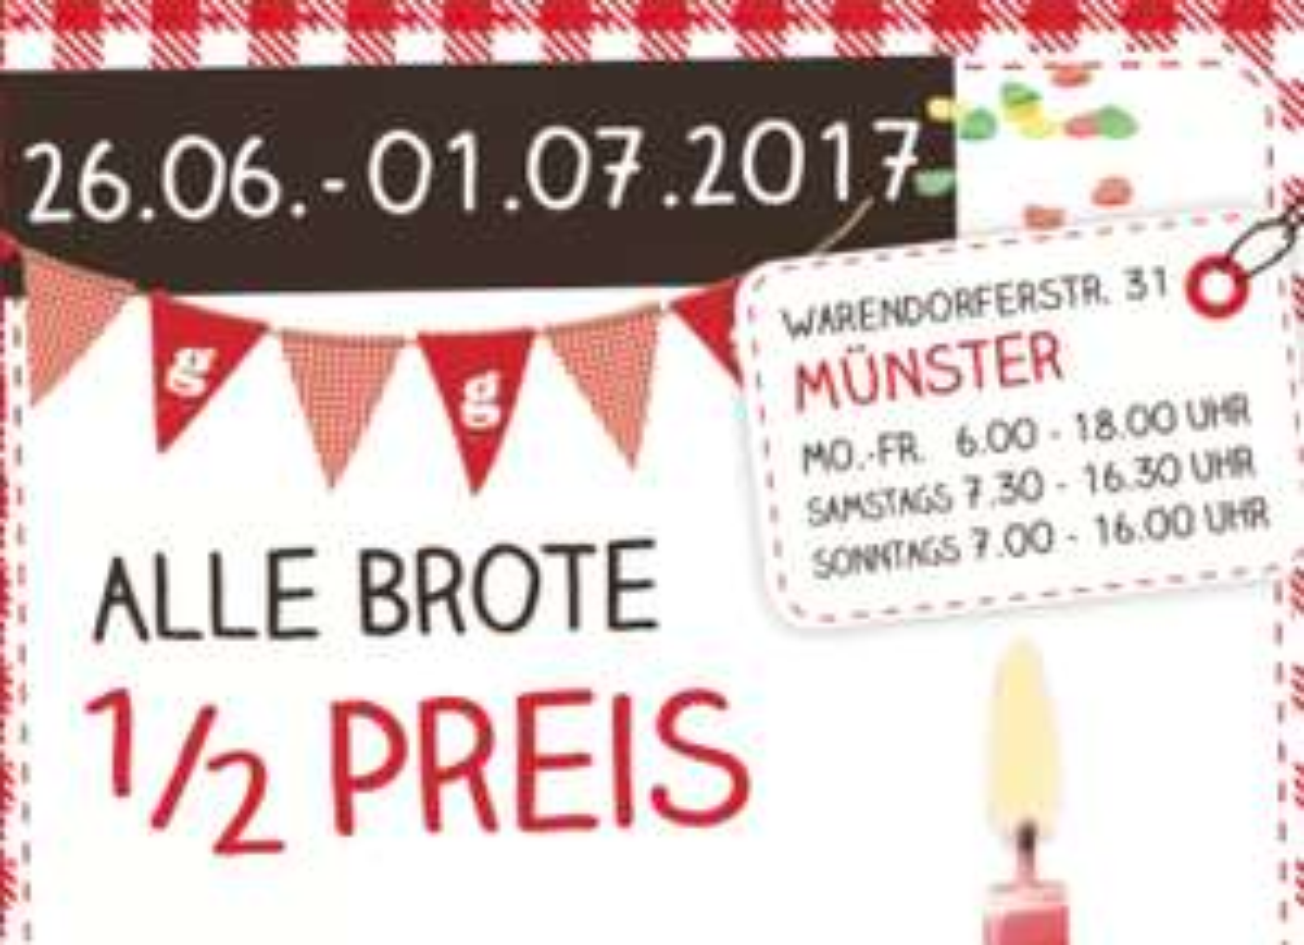 Geiping: alle Brote zum 1/2 Preis [Lokal Münster Warendorfer Str. 31] & [Lokal Kamen im Hornbach, Zollpost 6]